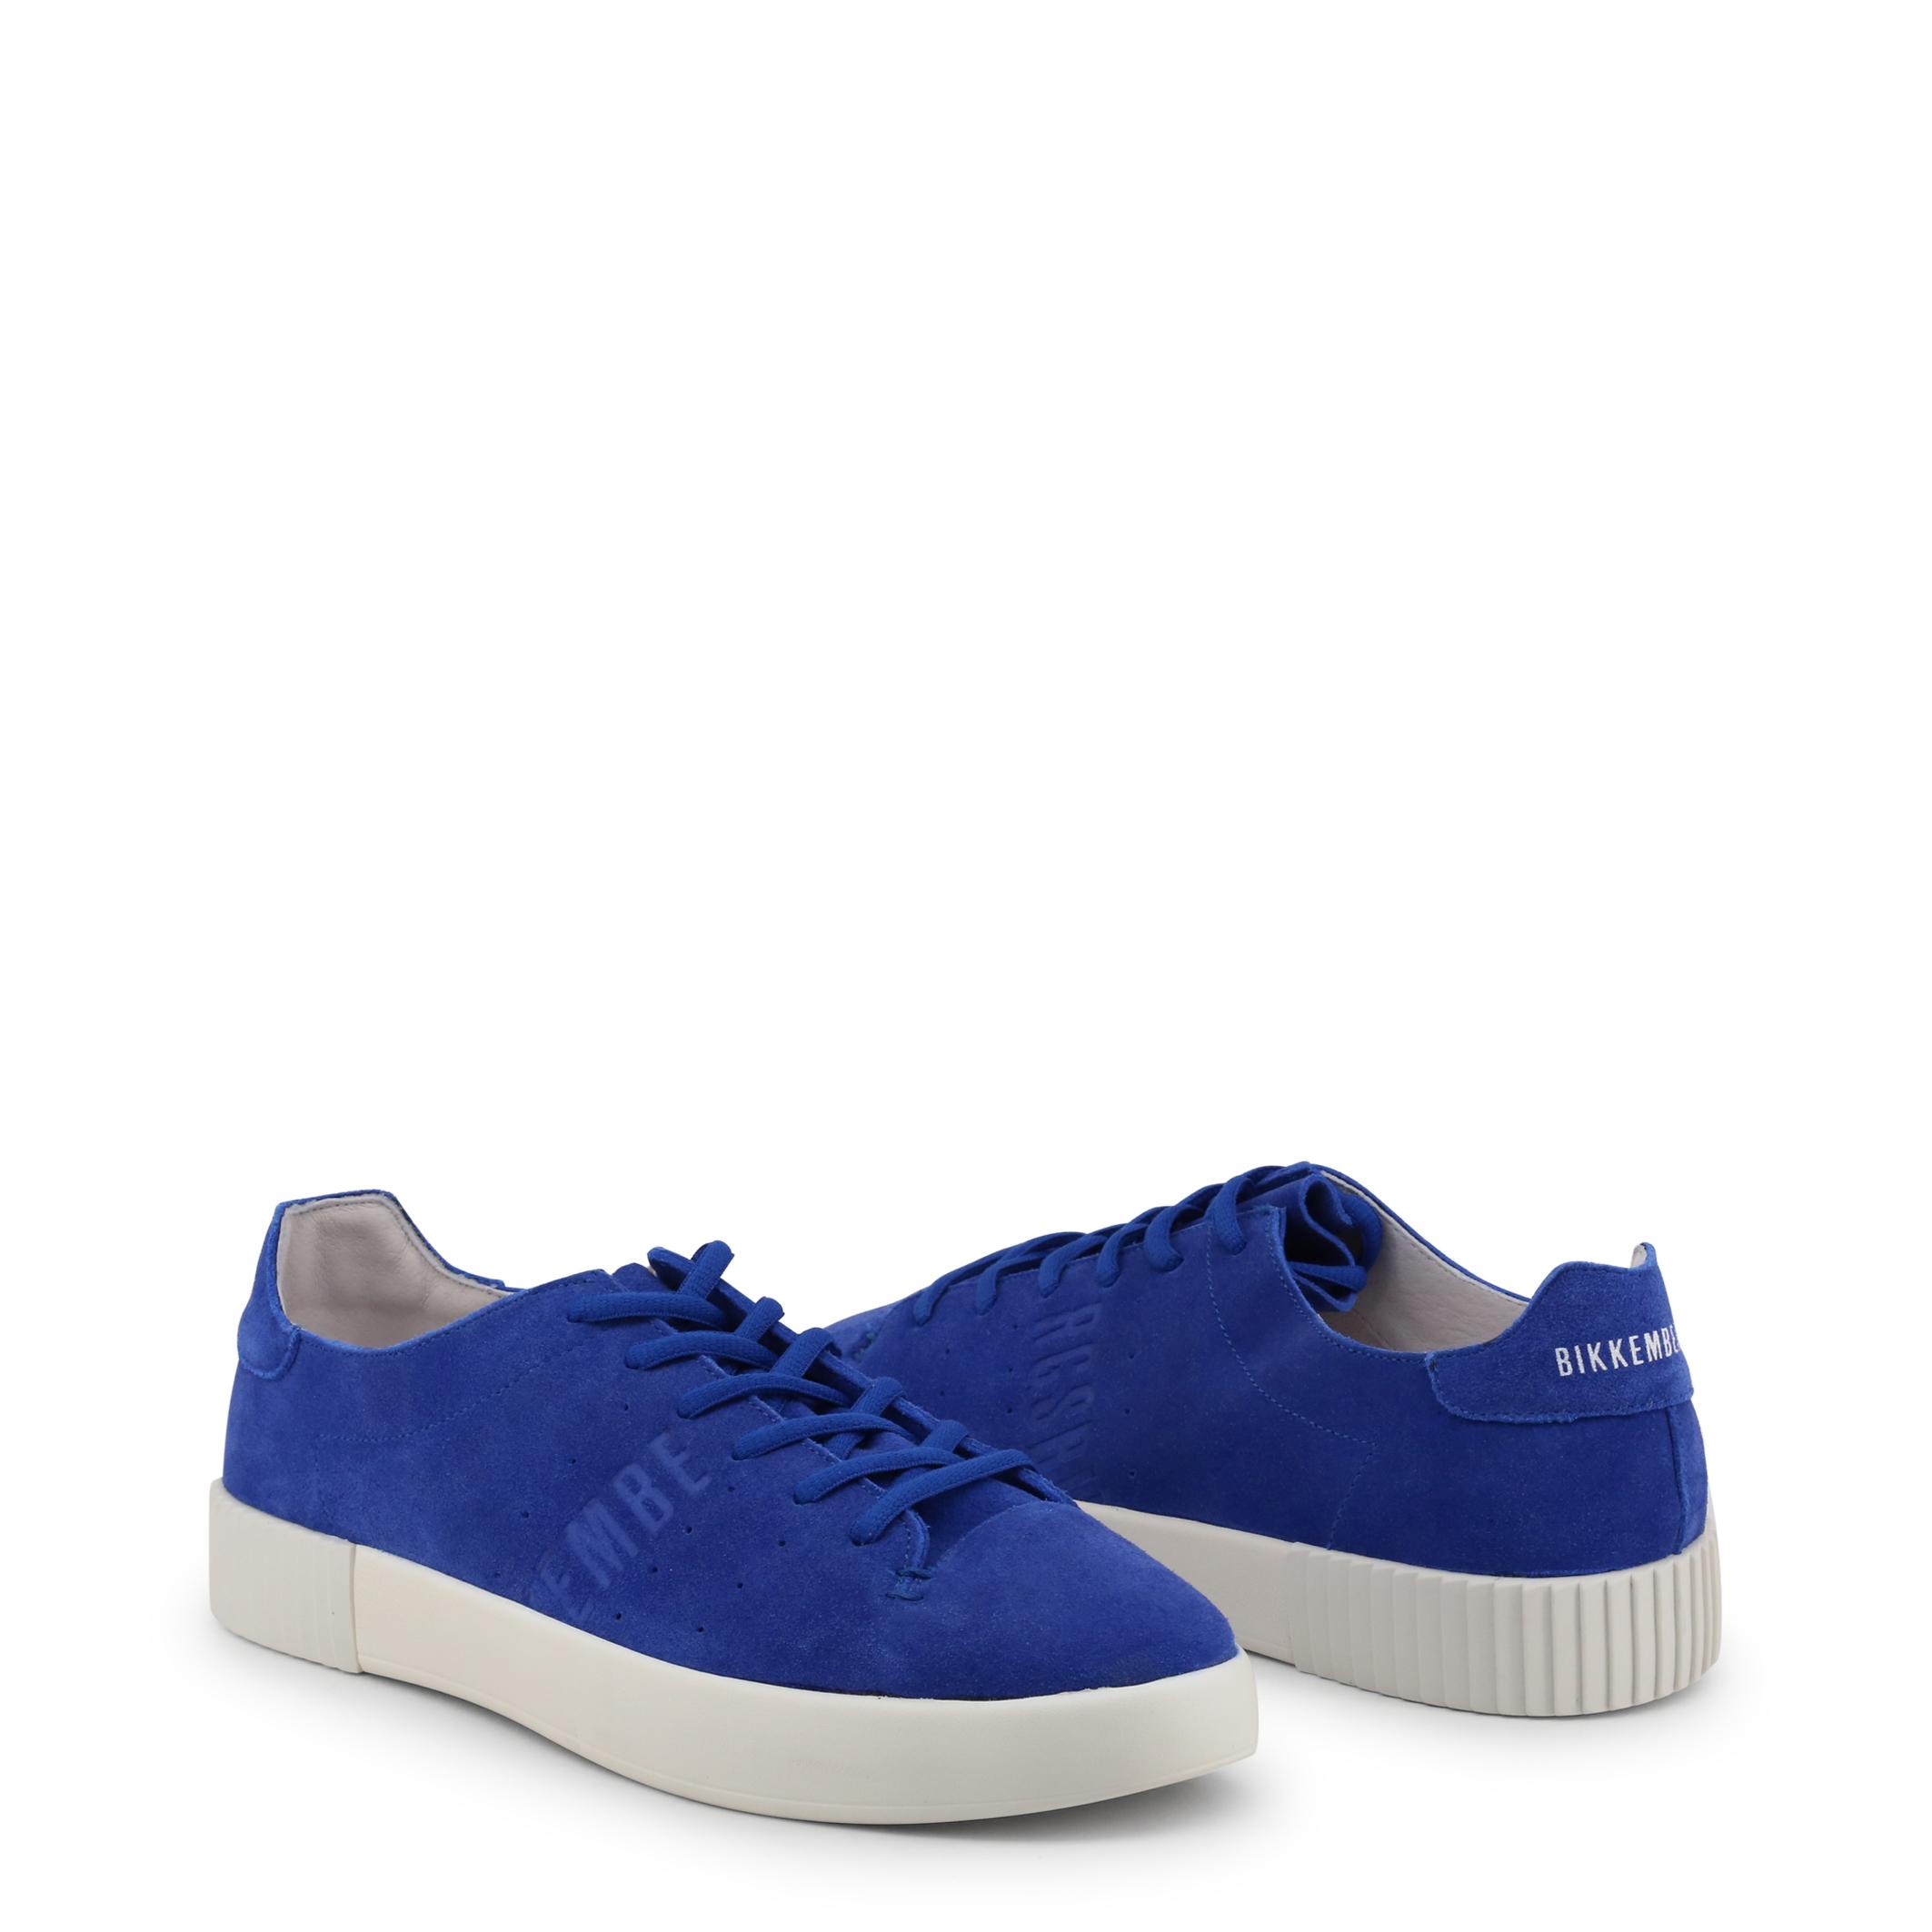 Sneakers-Bikkembergs-COSMOS-2100-SUEDE-Uomo-Blu-98816 miniatura 2